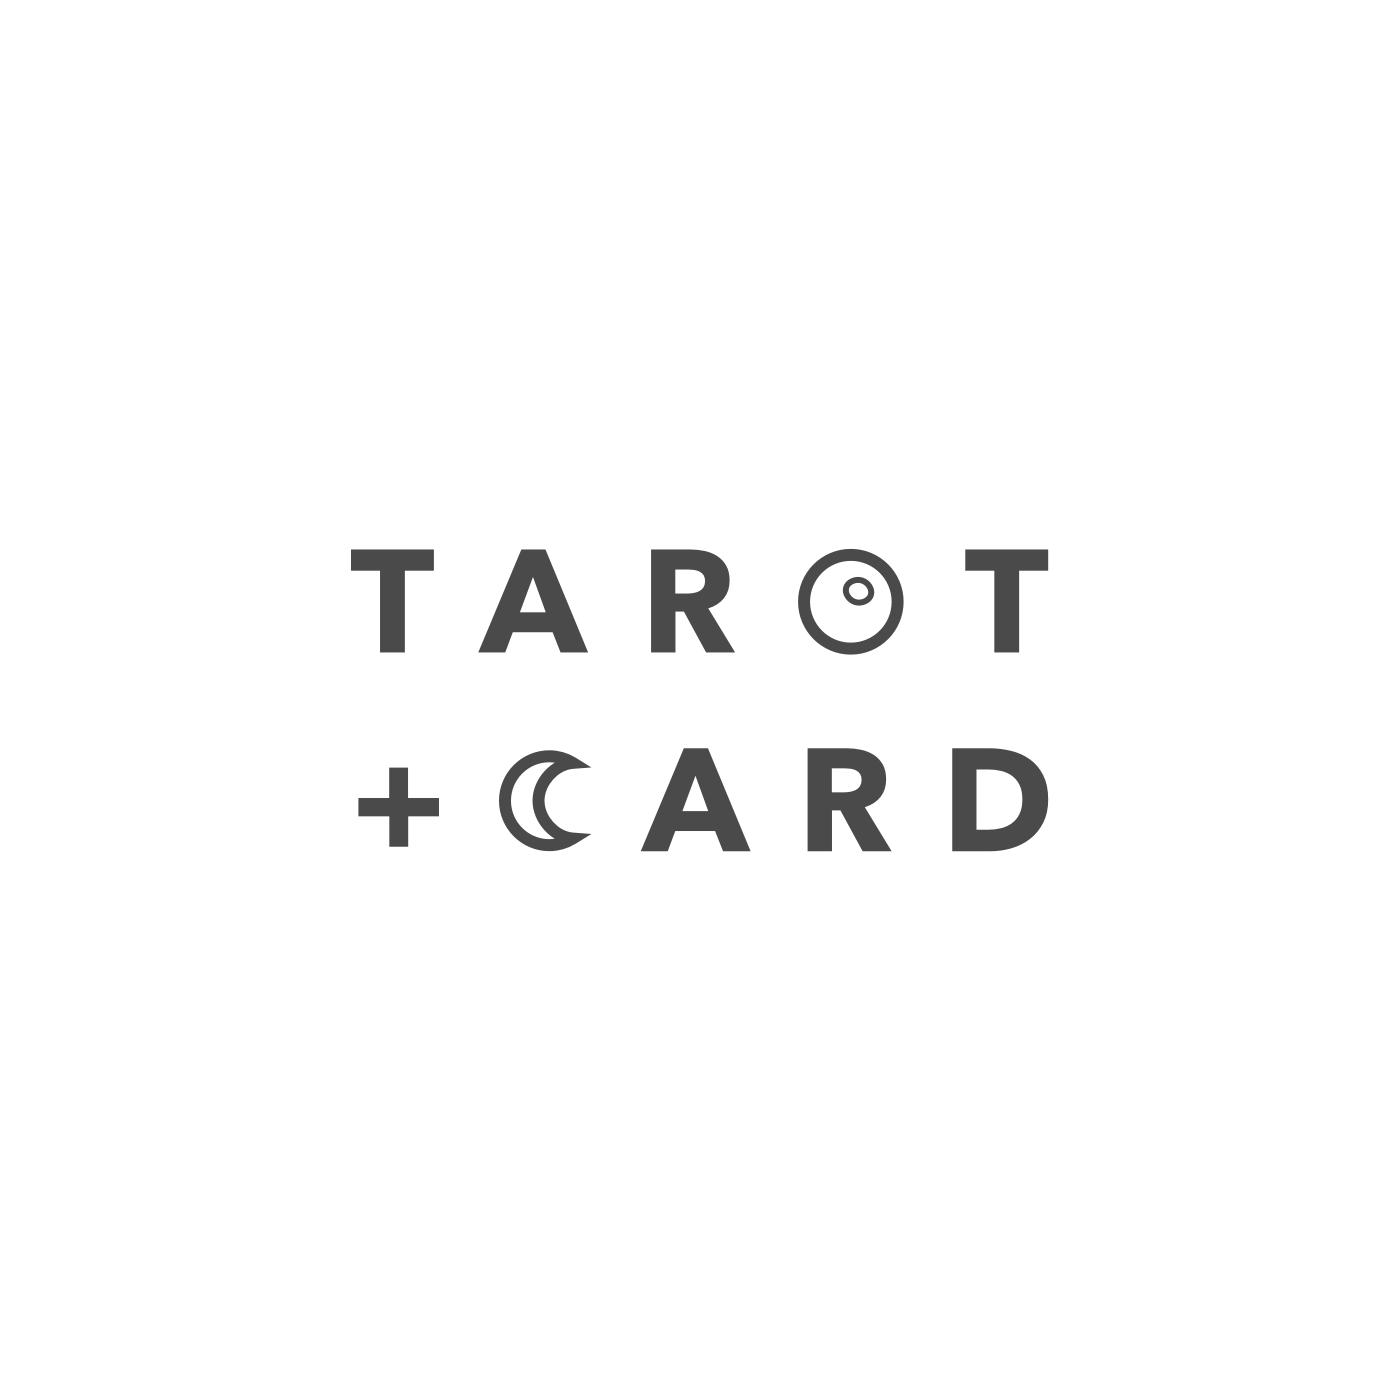 Tarot & Card Conceptual